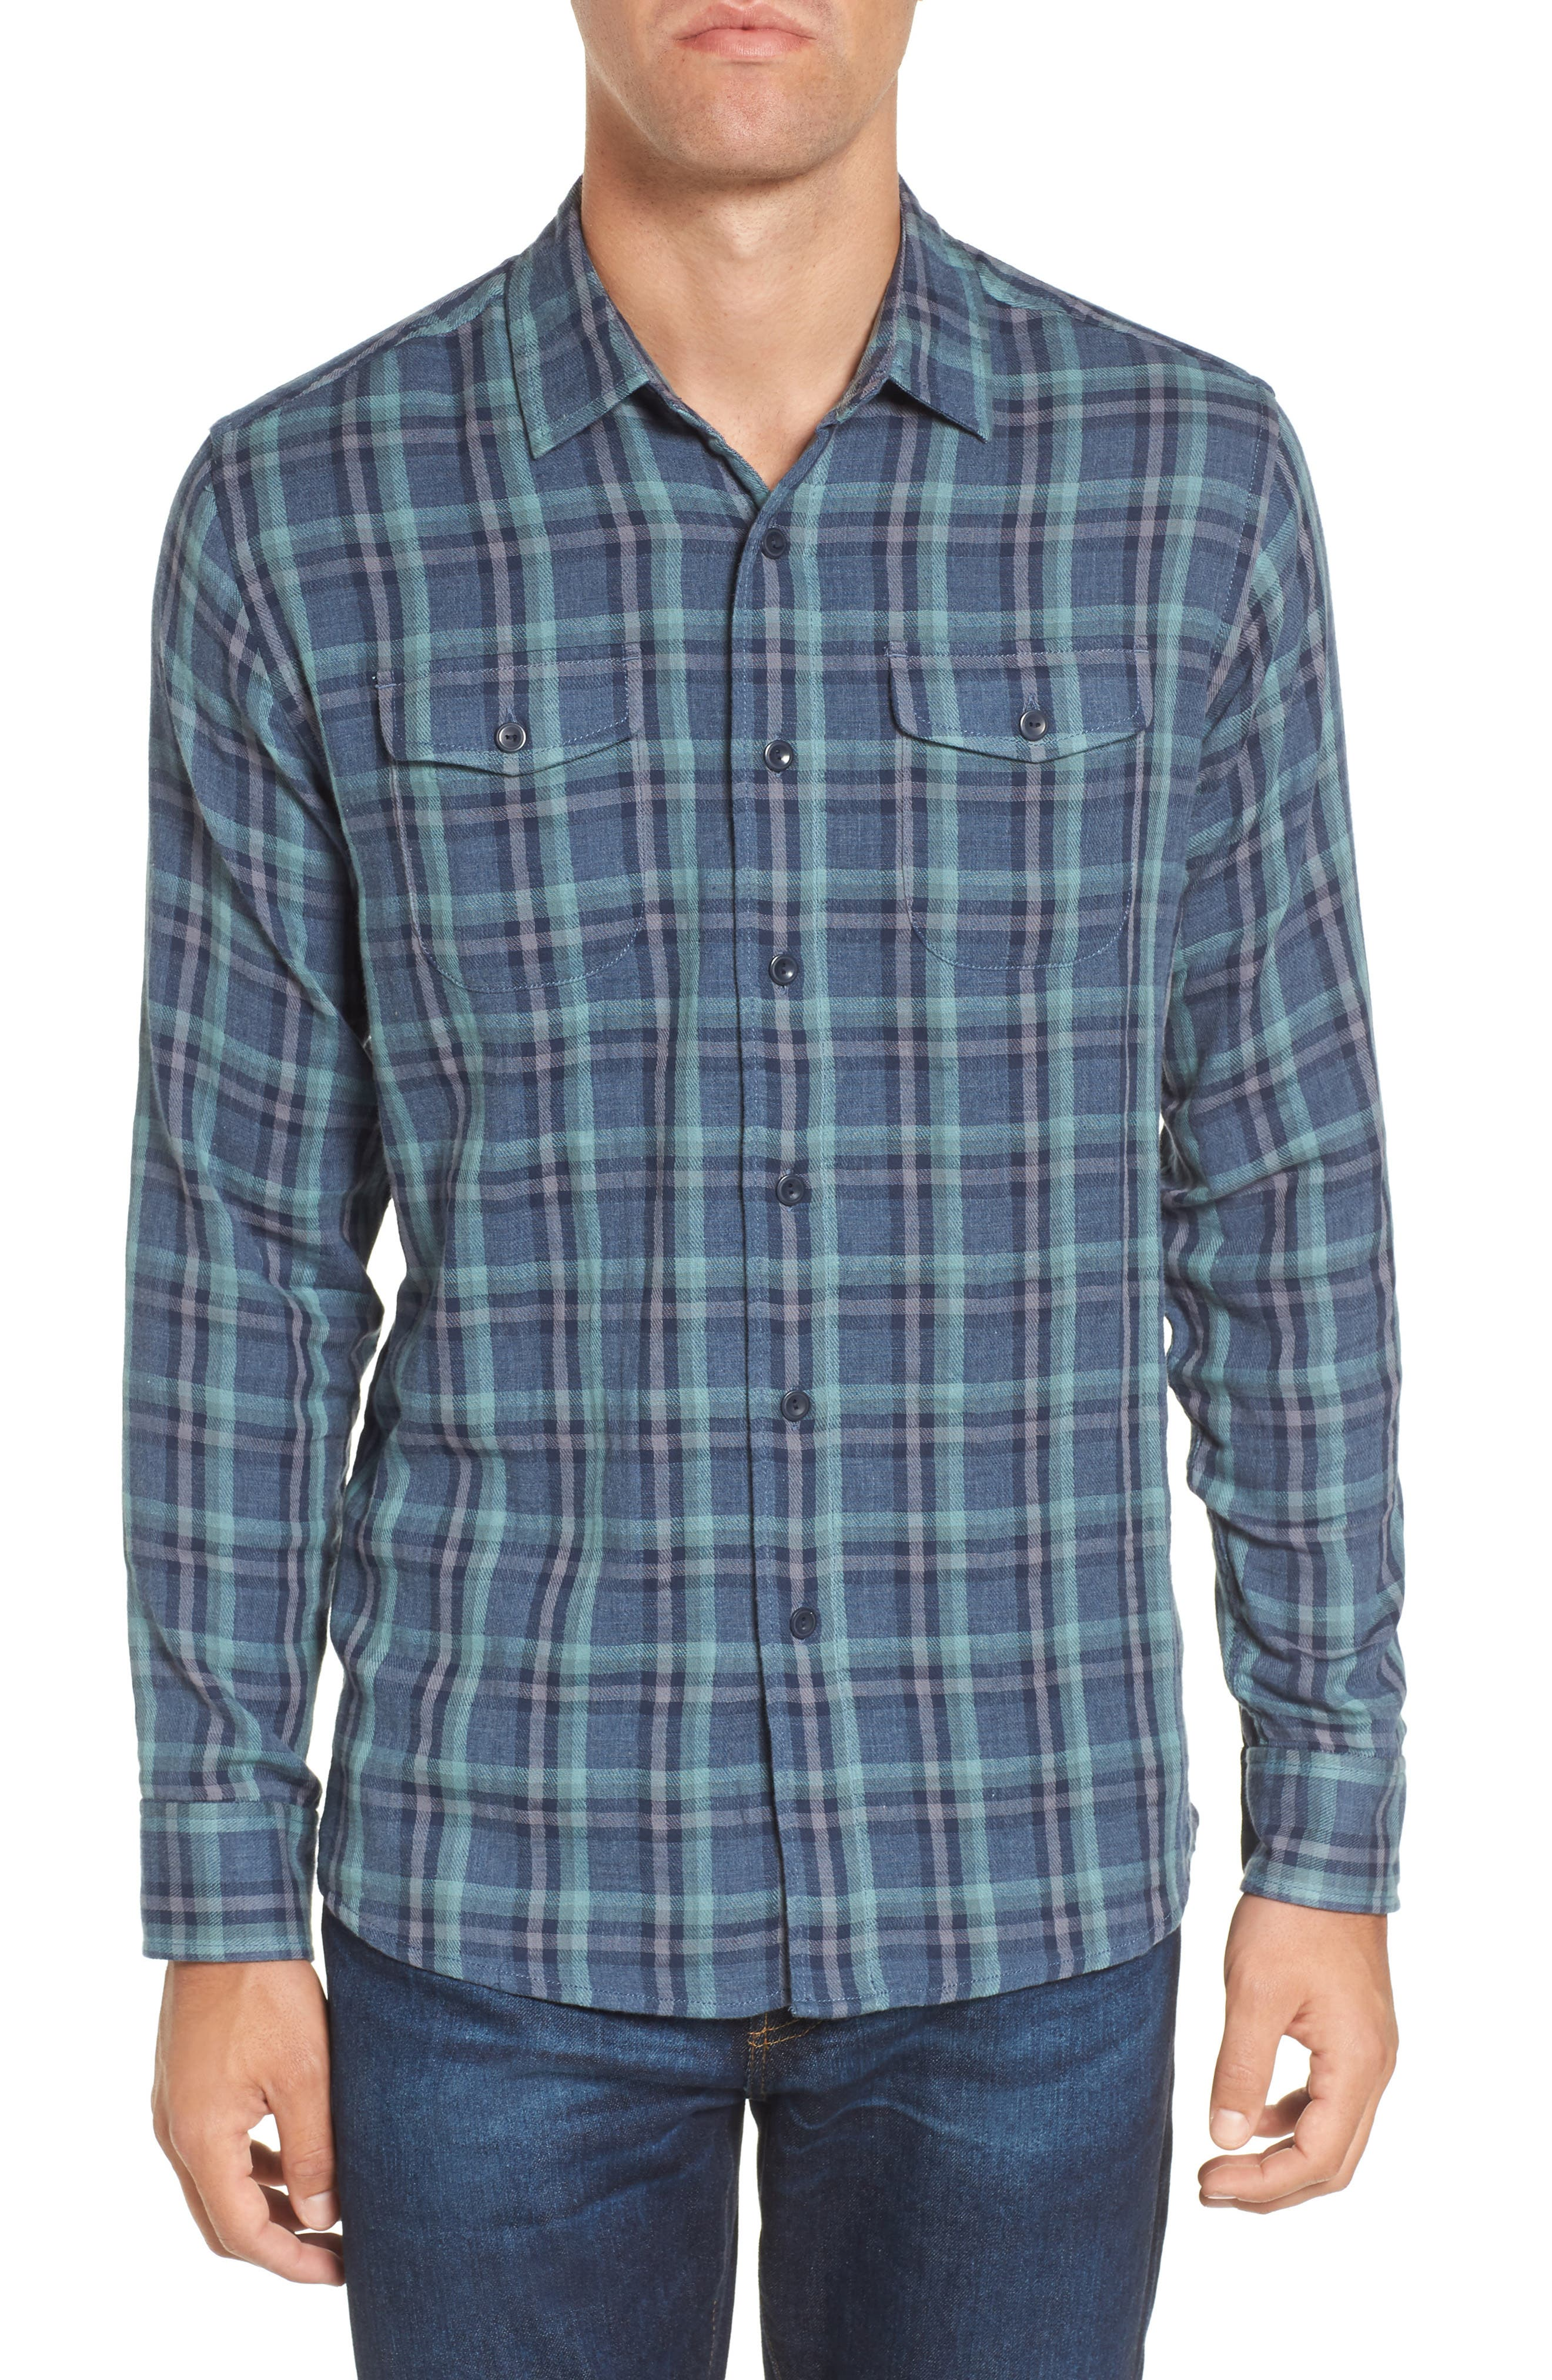 Smith Double Cloth Plaid Sport Shirt,                         Main,                         color, Blue Navy Seafoam